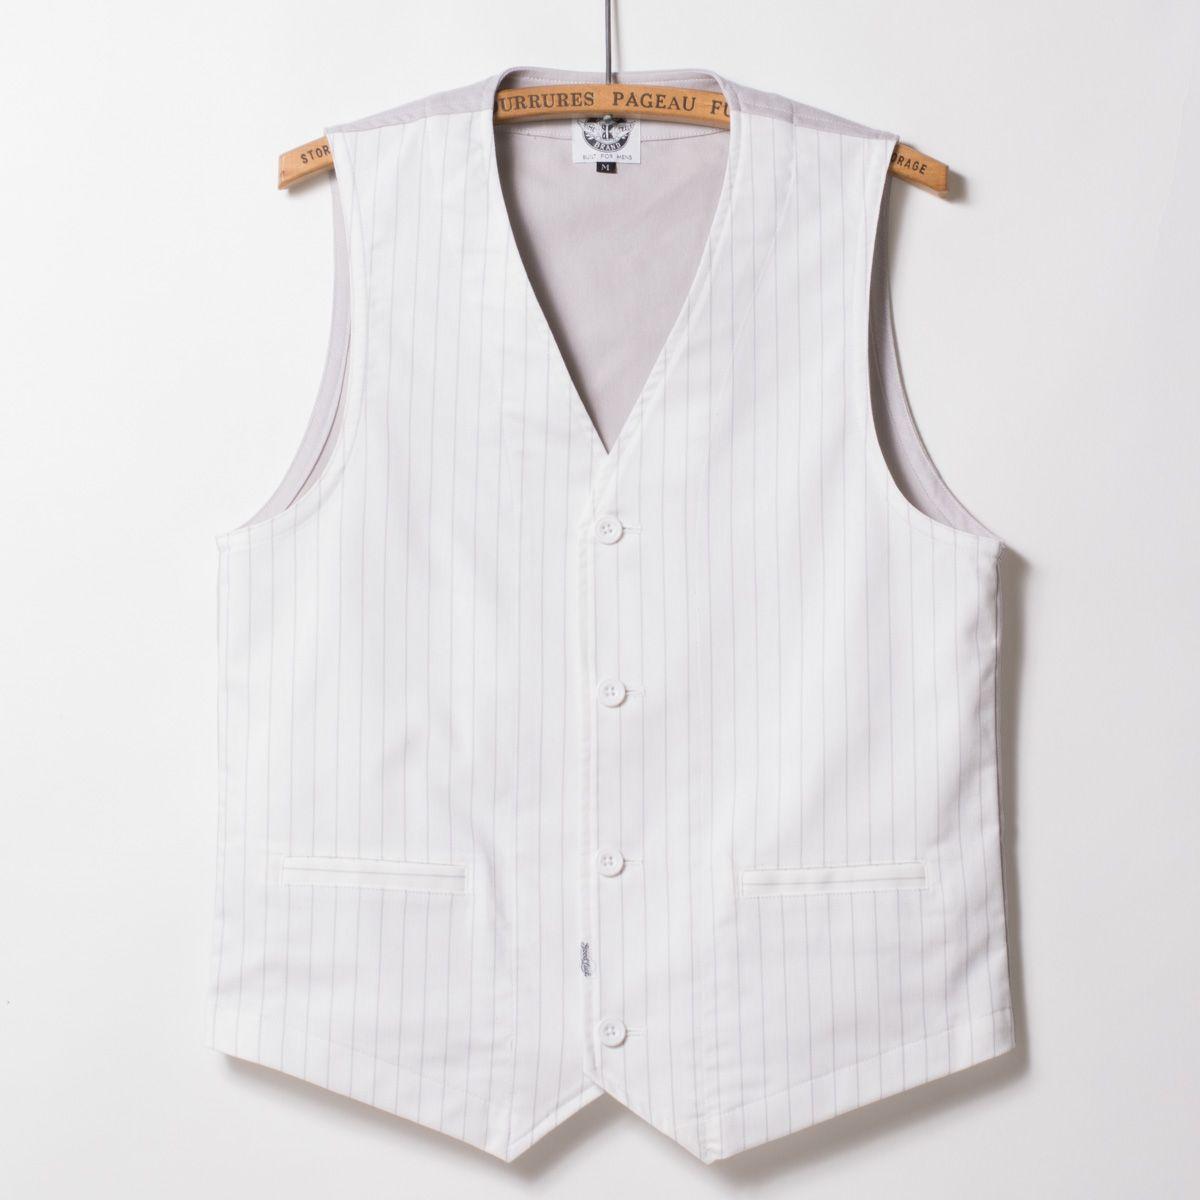 "Stretch Four Vest ""White Impact"". Color: White&GrayStripe. Material: Cotton100%. Sizes: S/M/L/XL."